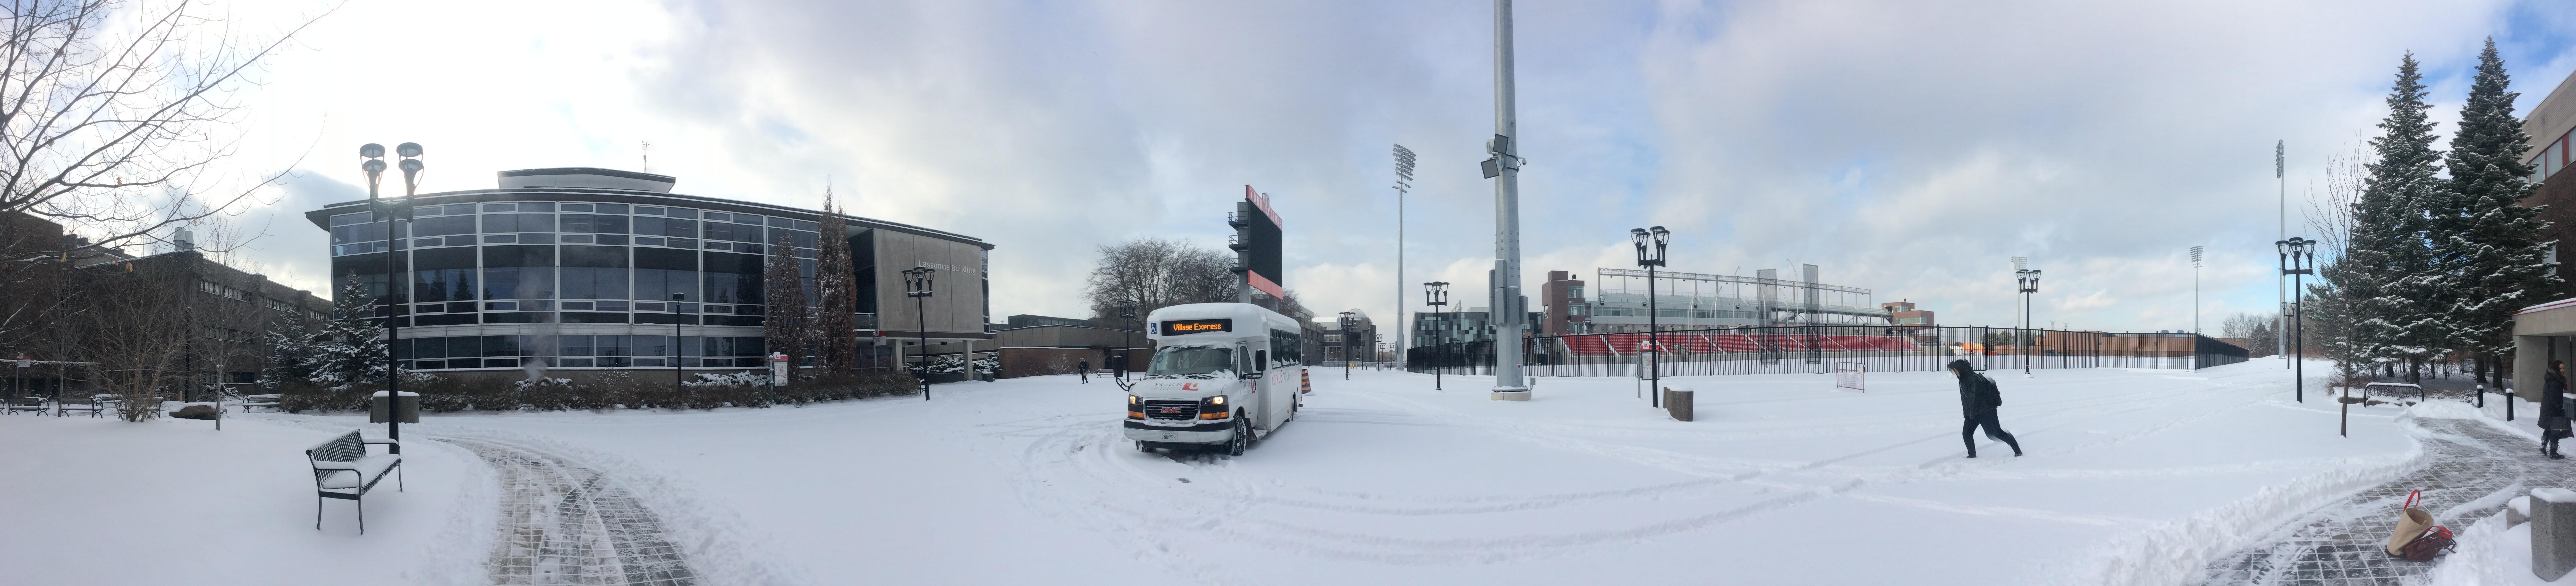 York University campus in the snow